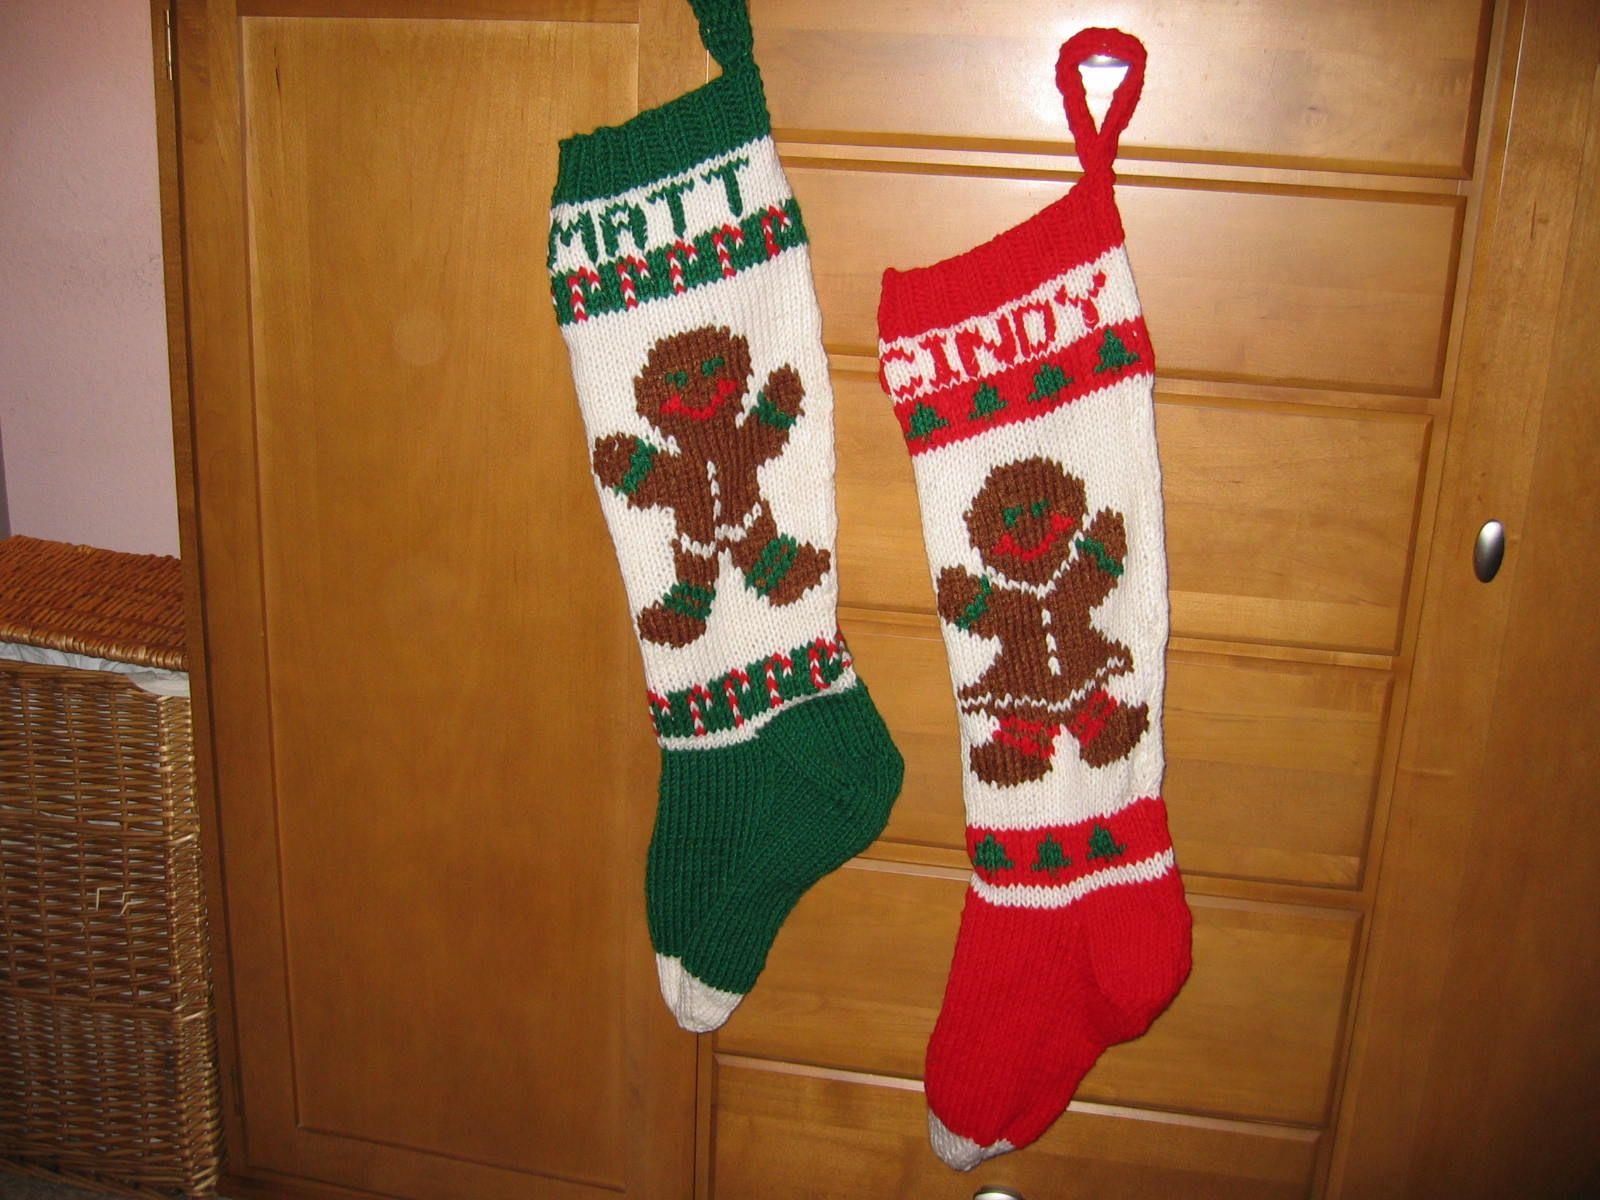 Knitting Christmas Stocking : Knit christmas stockings purl